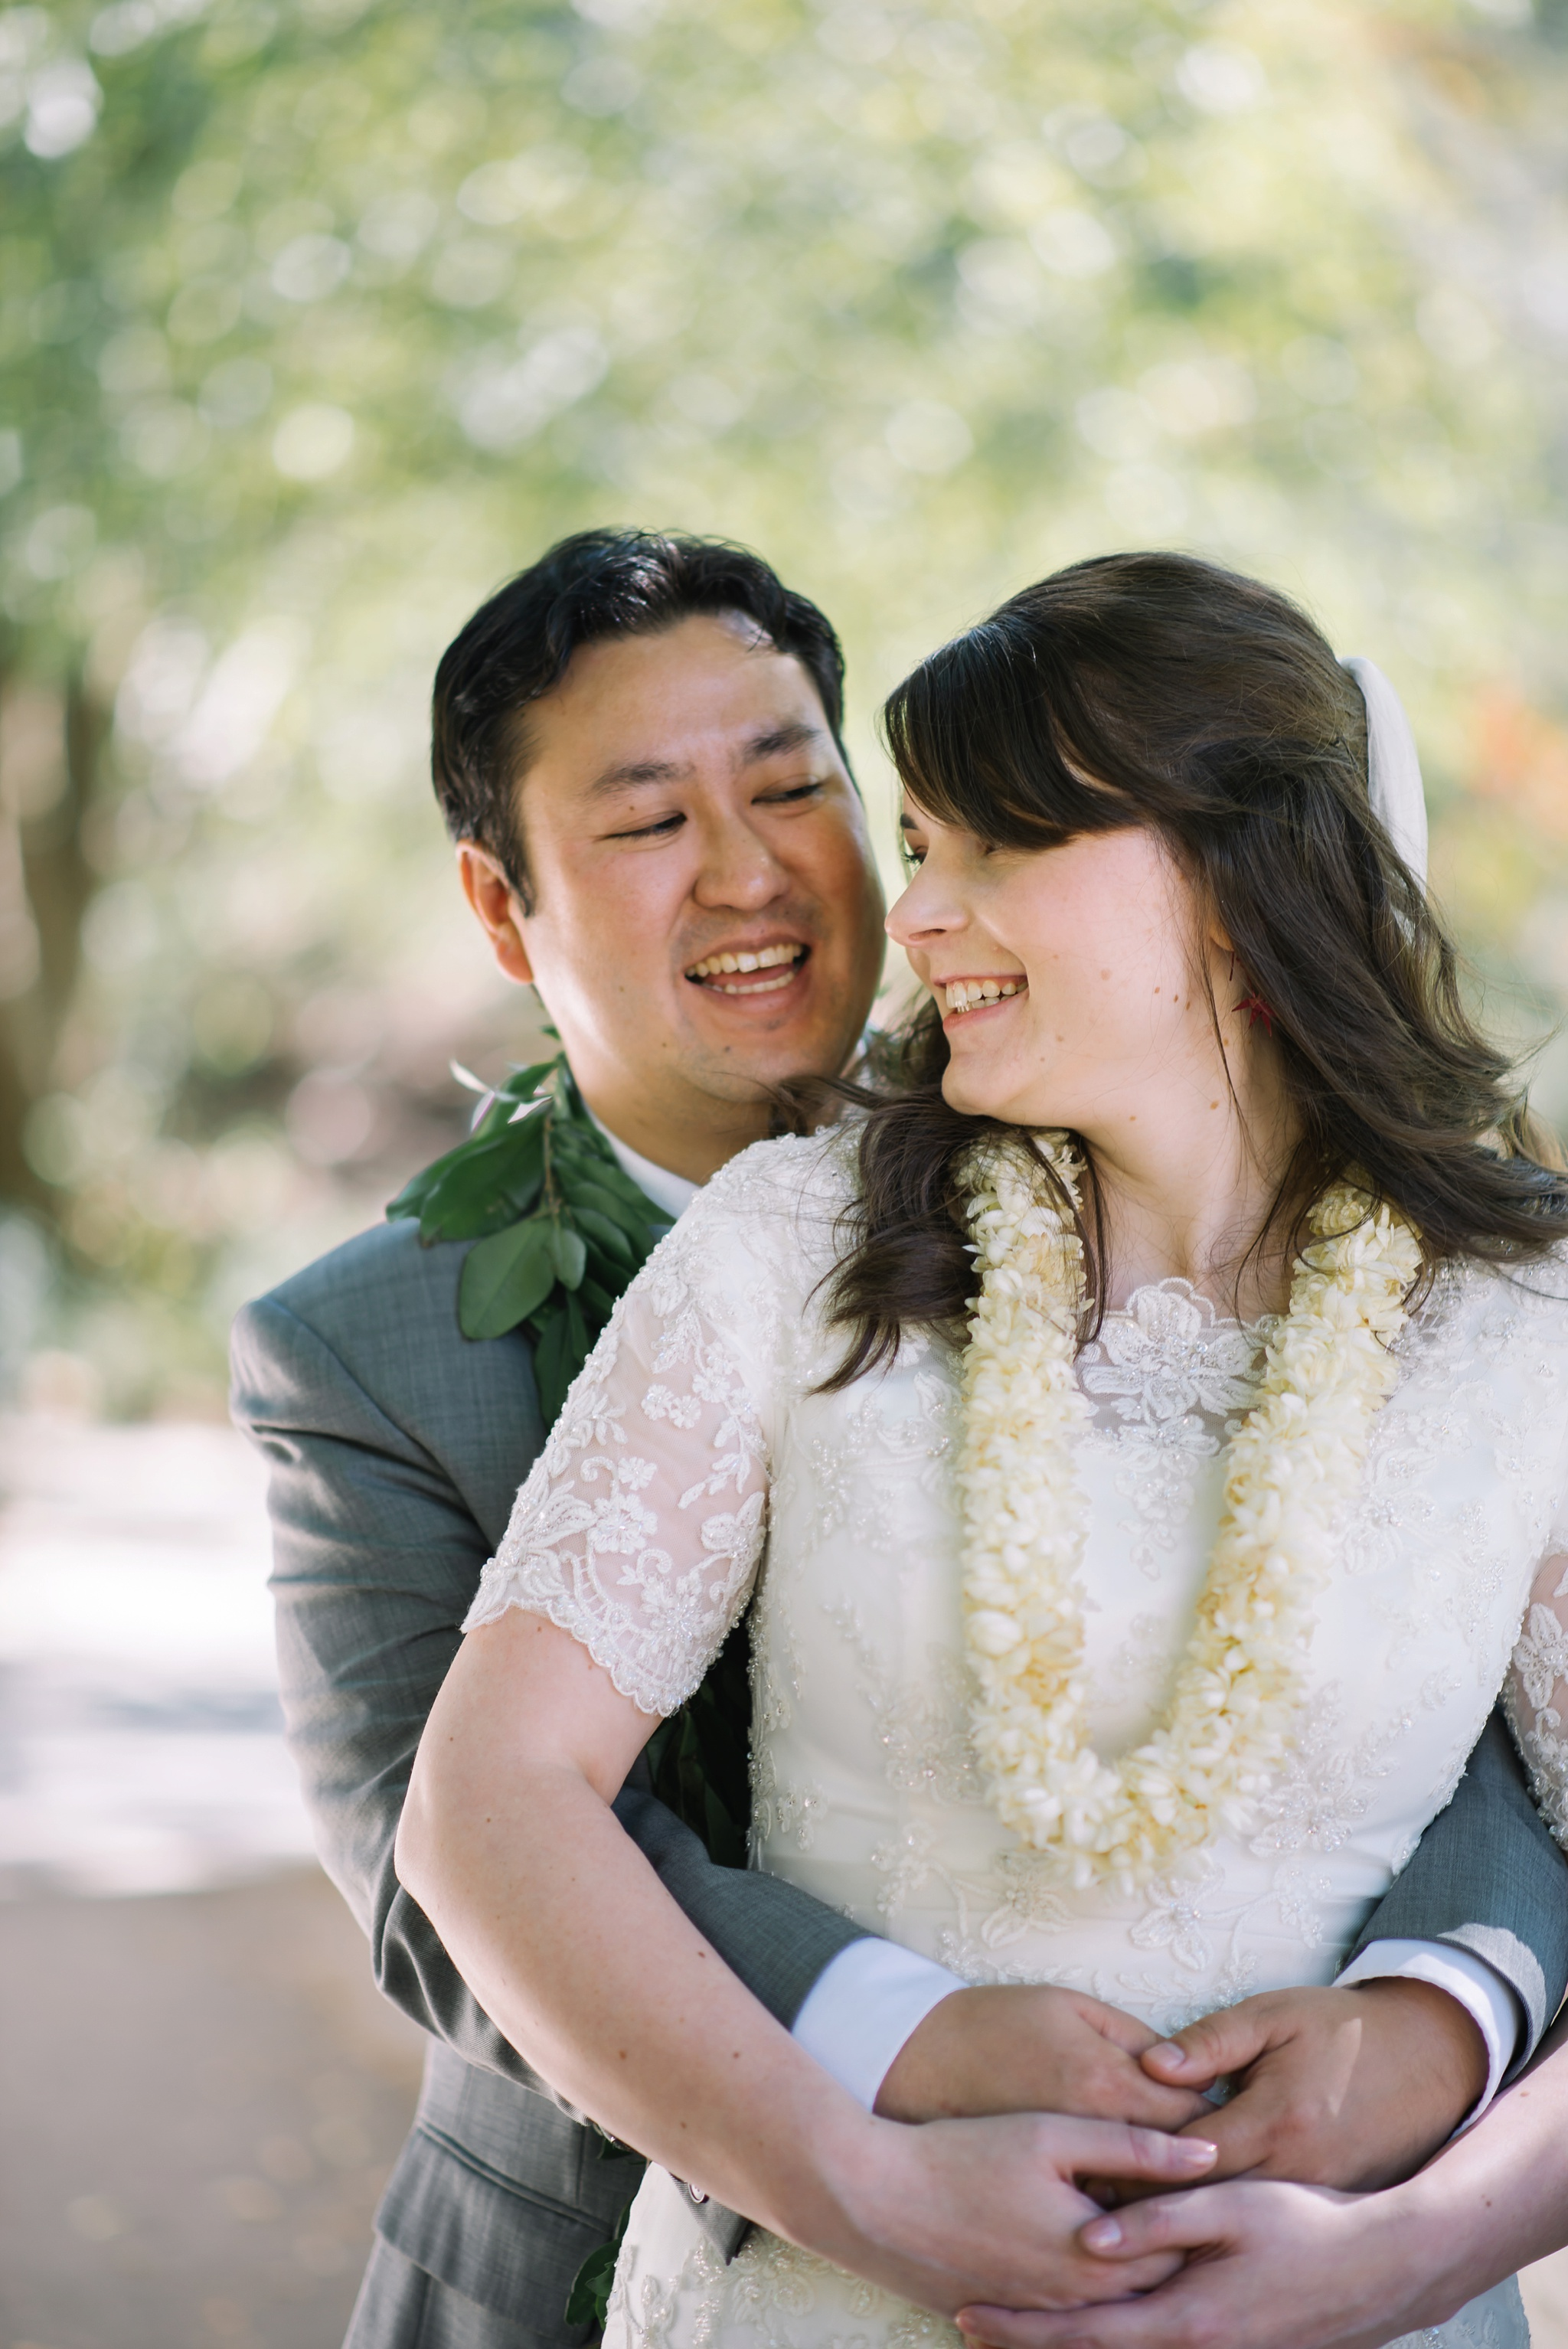 Park City Wedding Photographer Ali Sumsion 067